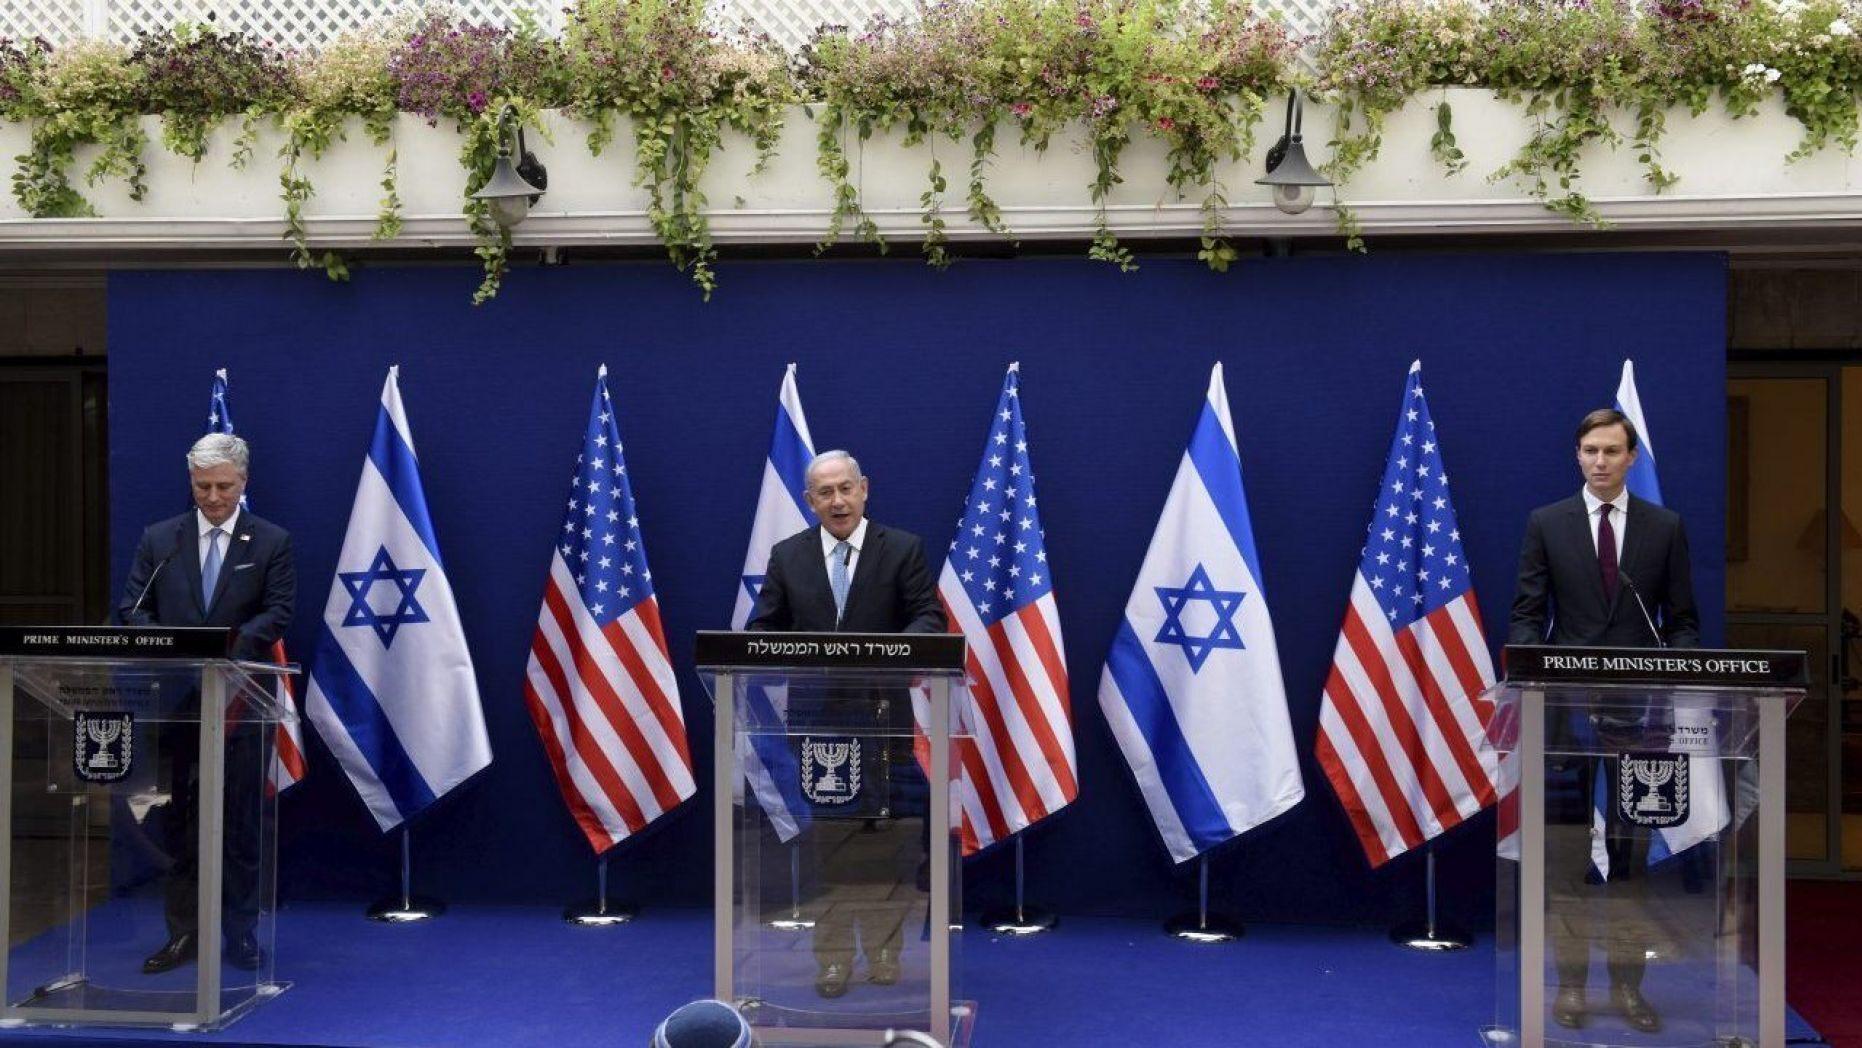 Netanyahu says Israel has secret talks with Arab, Muslim leaders